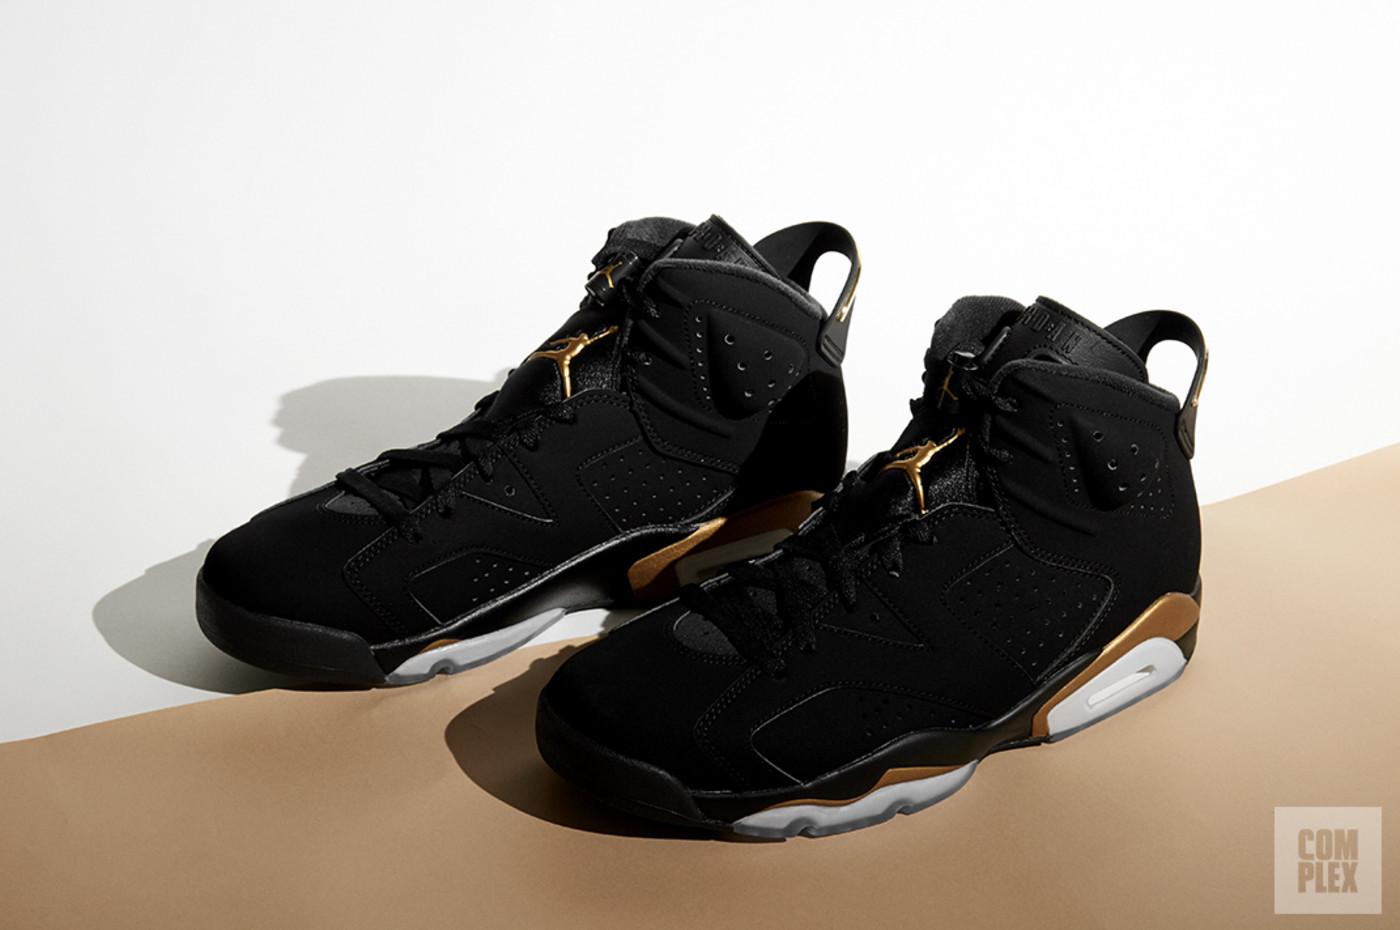 How the DMP Air Jordans Defined Sneaker Culture